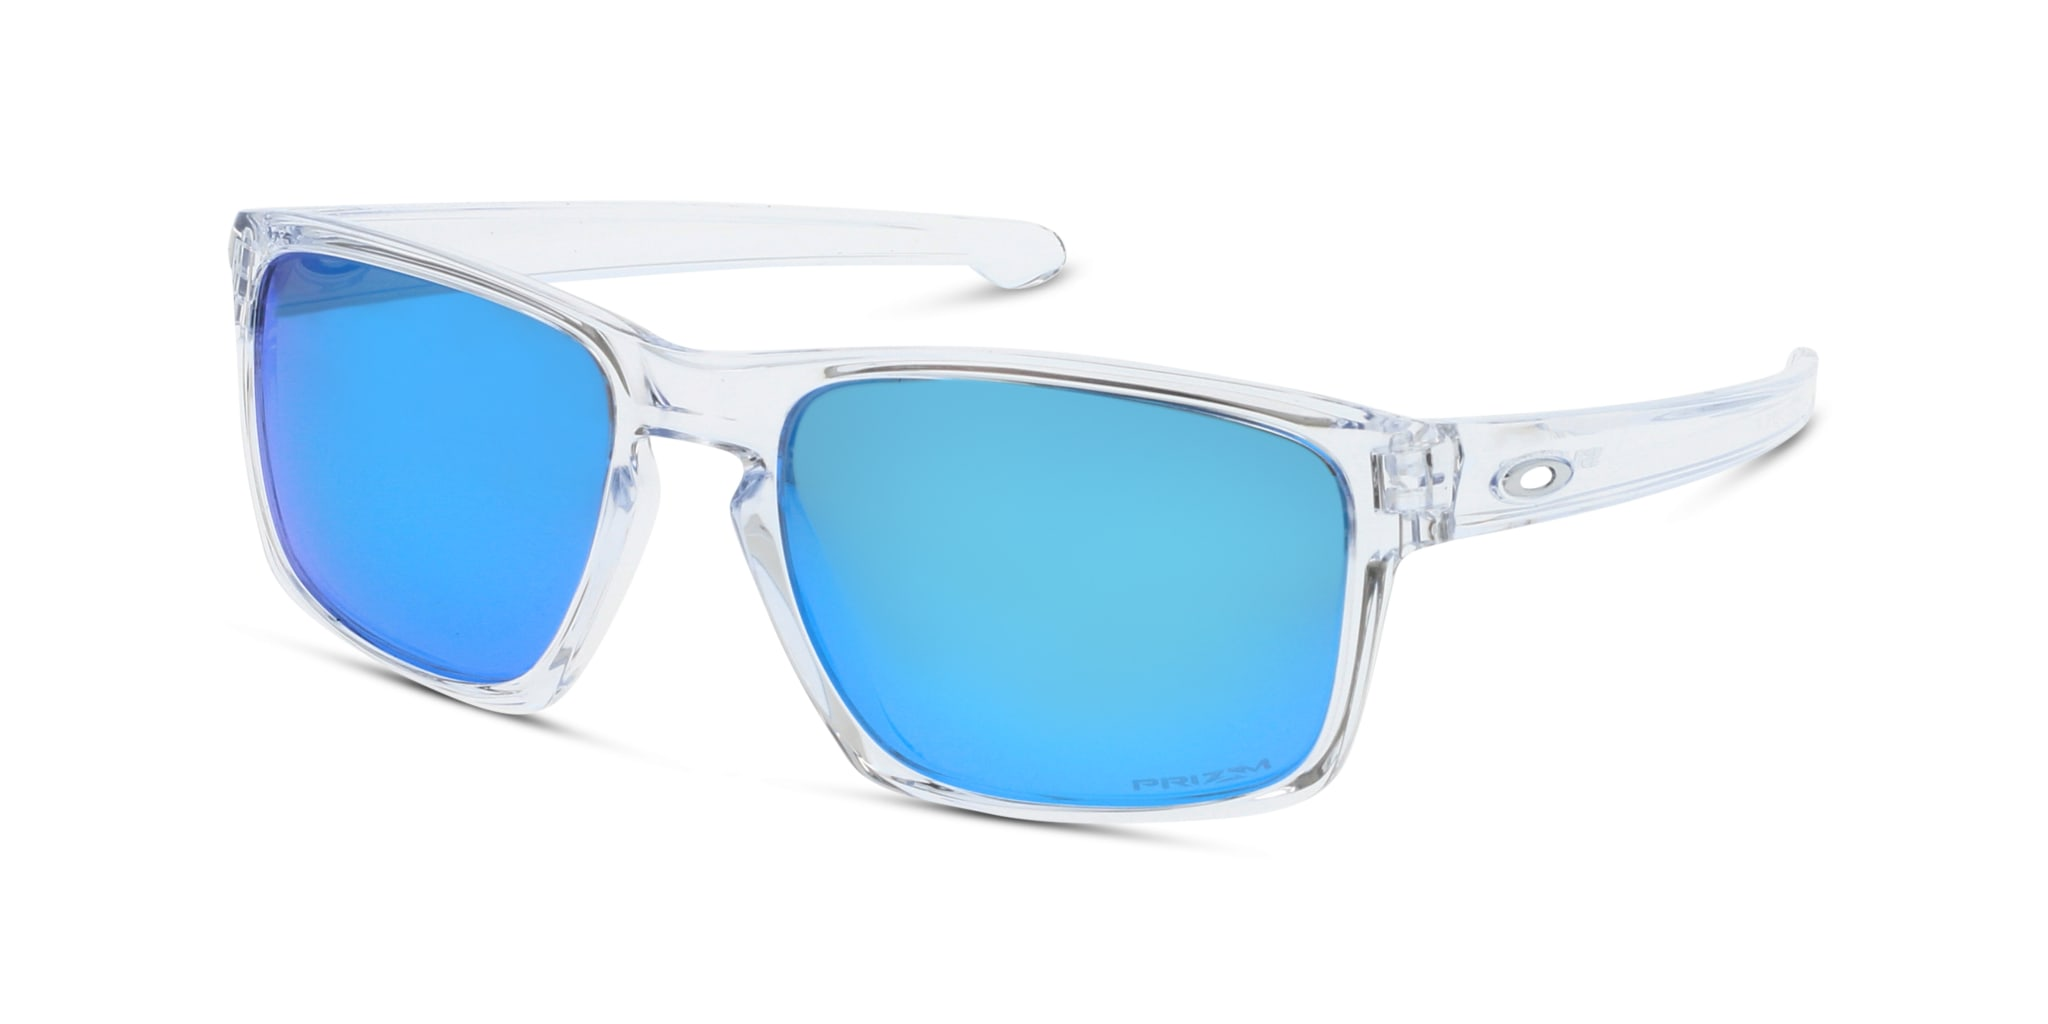 888392279637-angle-01-oakley-glasses-eyewear-pair